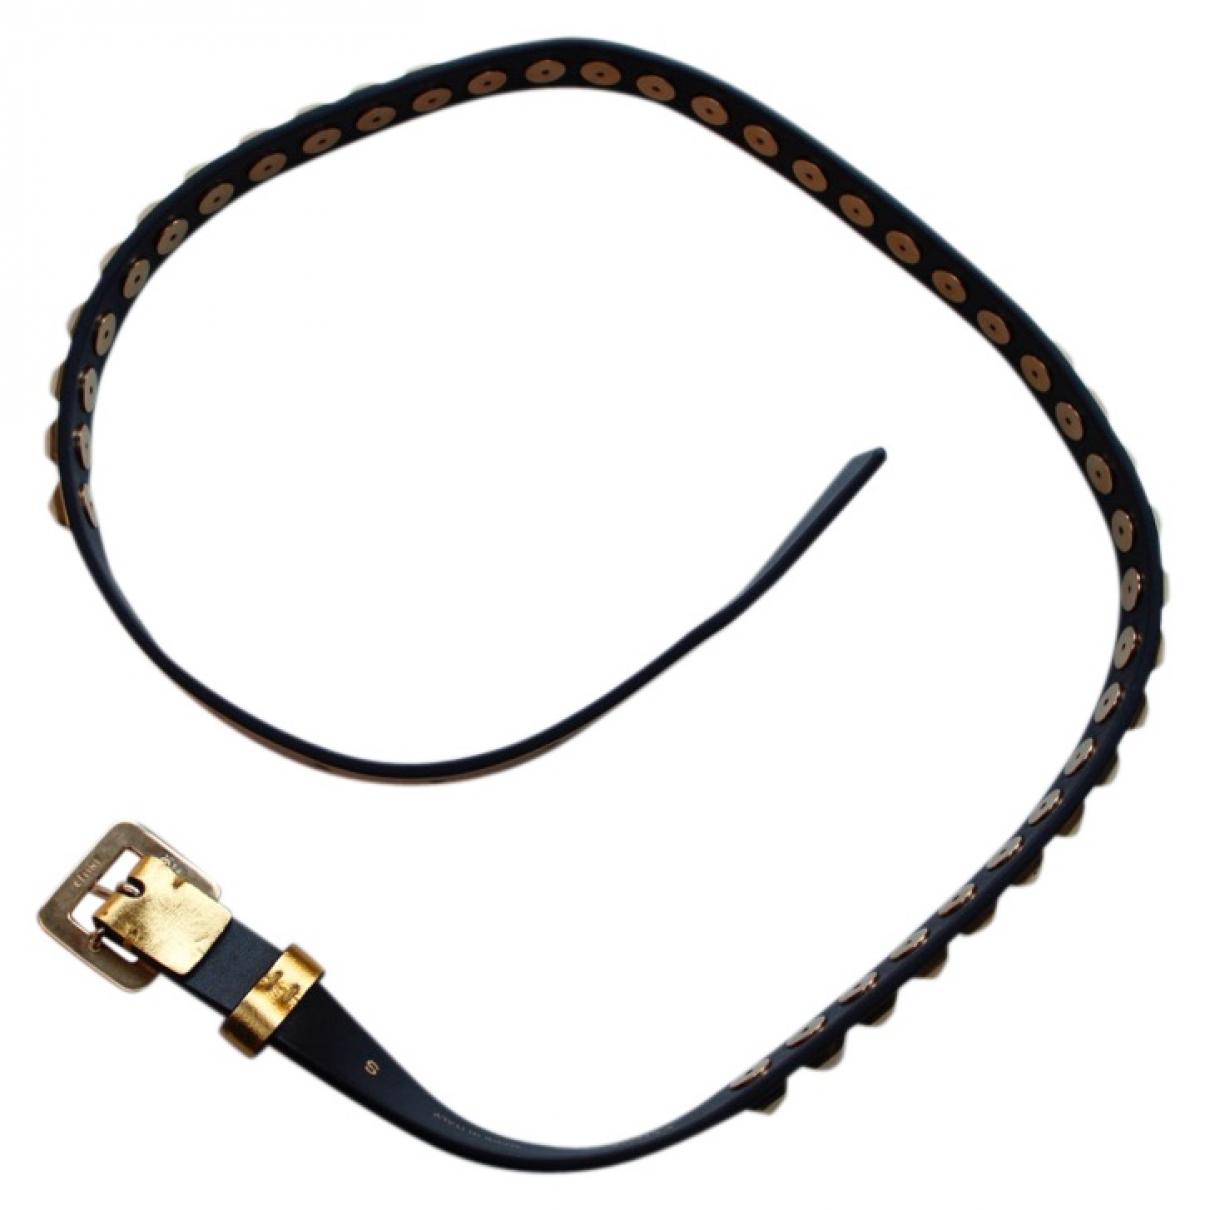 Cinturon de Cuero Celine